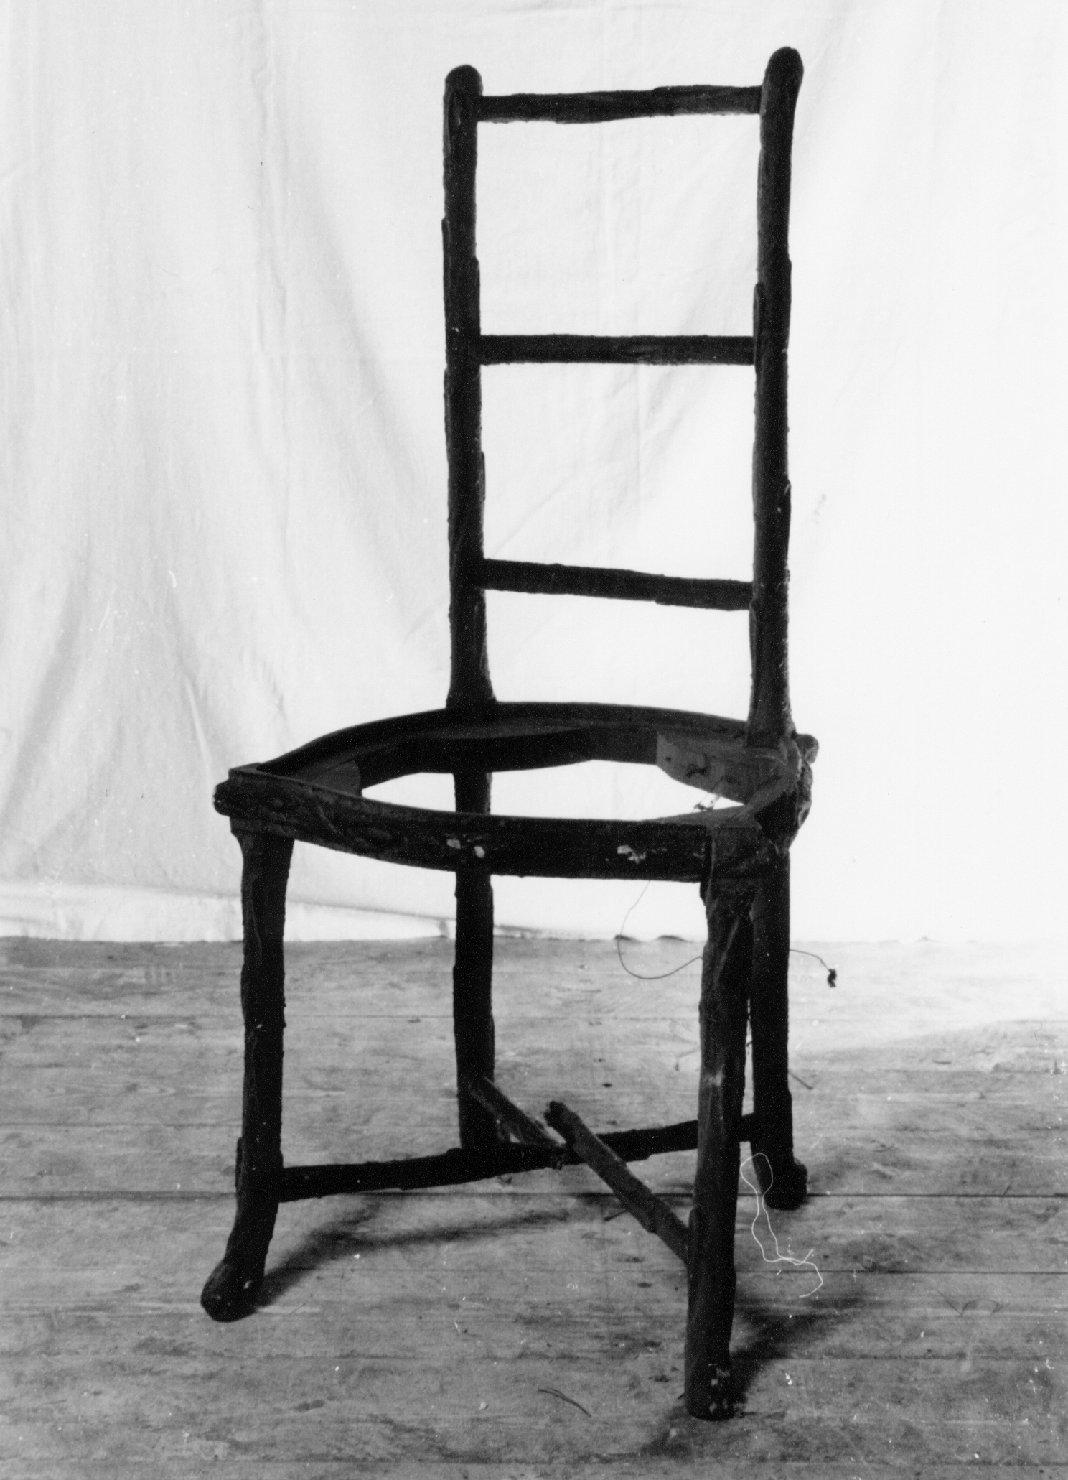 sedia, opera isolata - manifattura veneta (metà sec. XIX)